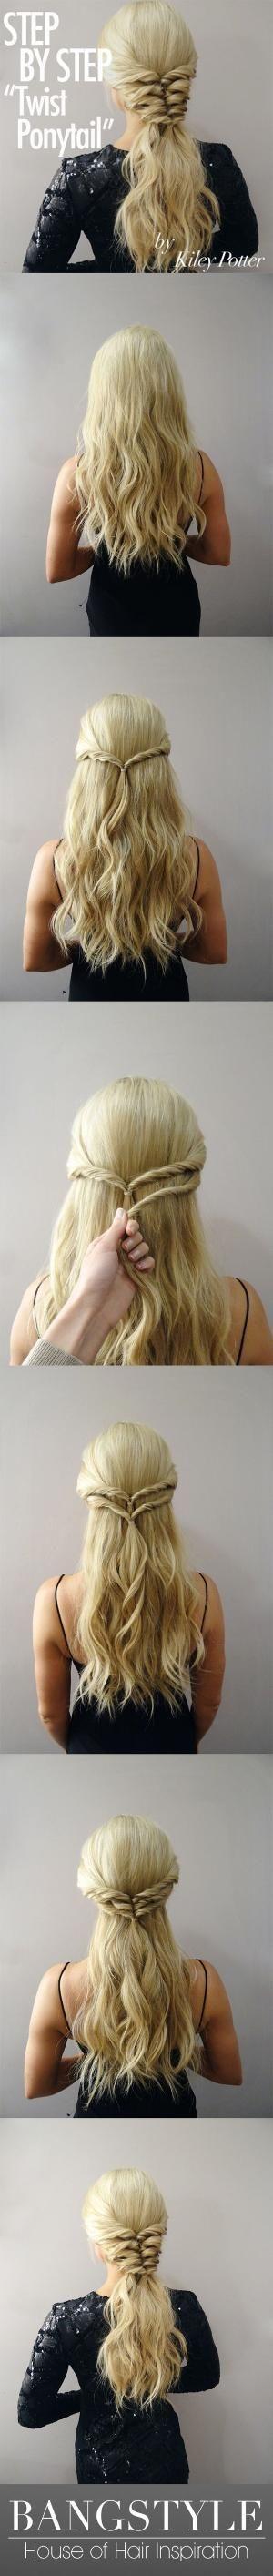 best moda y belleza images on pinterest cute hairstyles hair